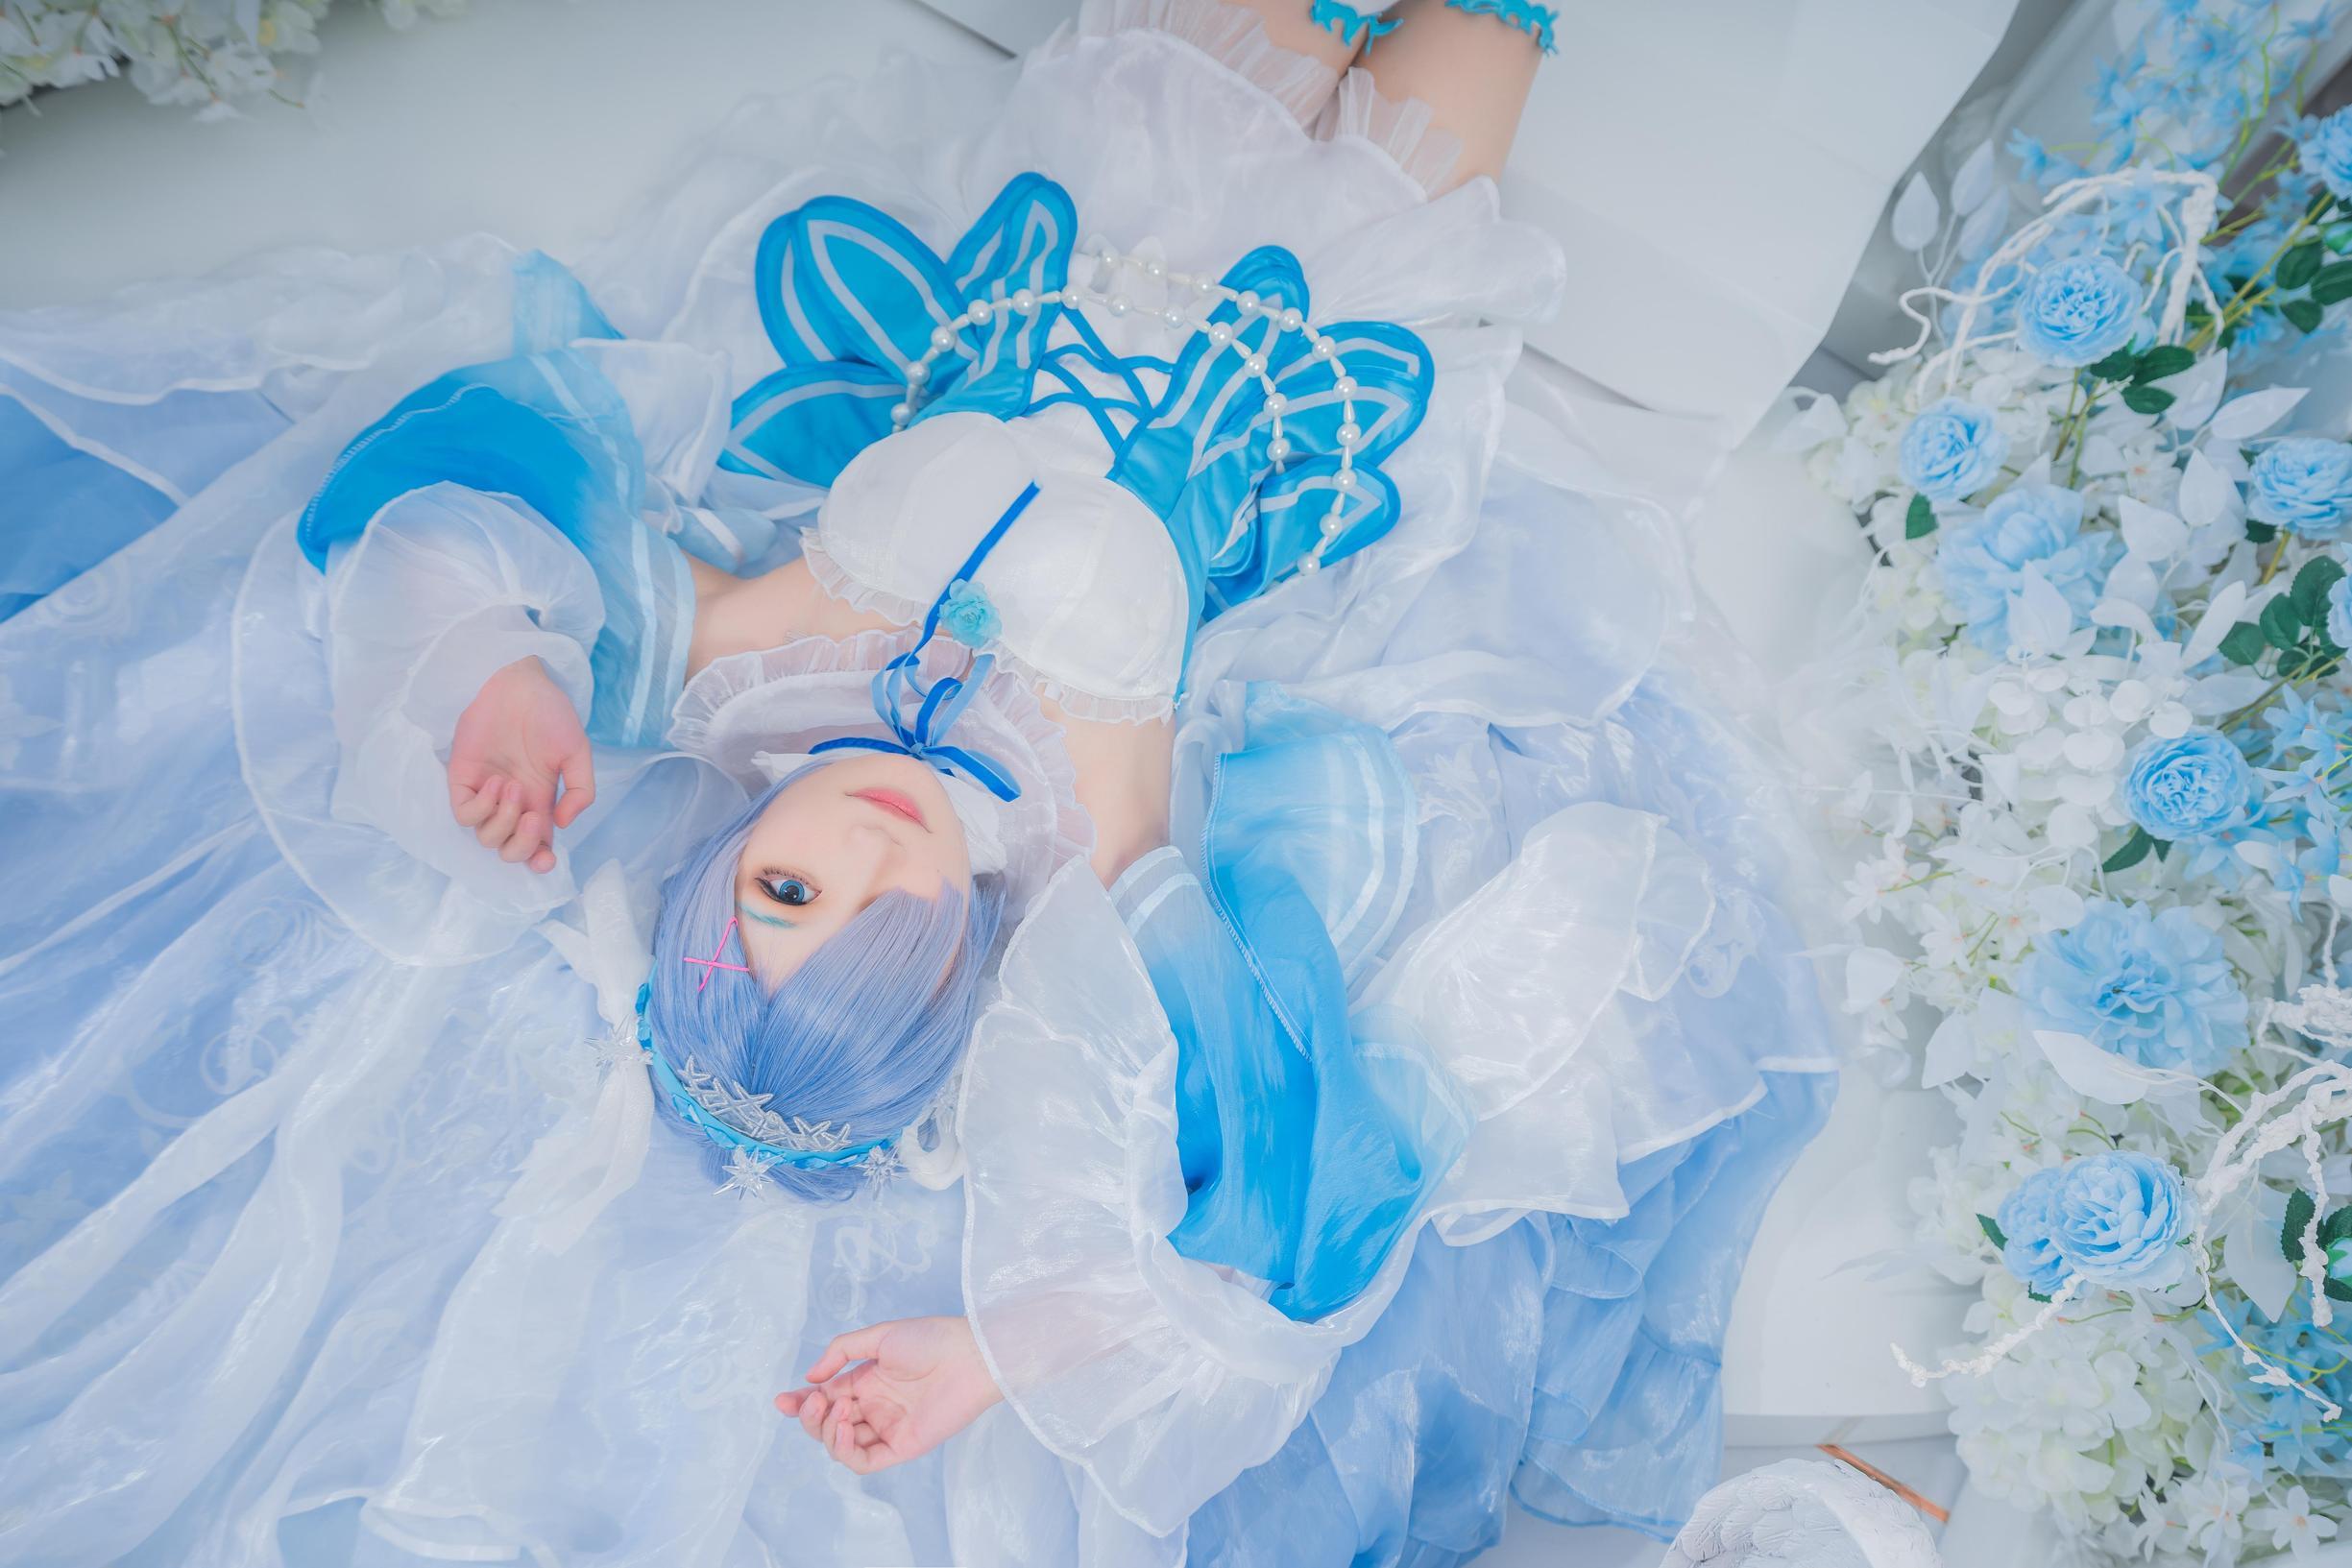 《RE:从零开始的异世界生活》蕾姆cosplay【CN:元素素素素】 -6岁cosplay女装图片插图